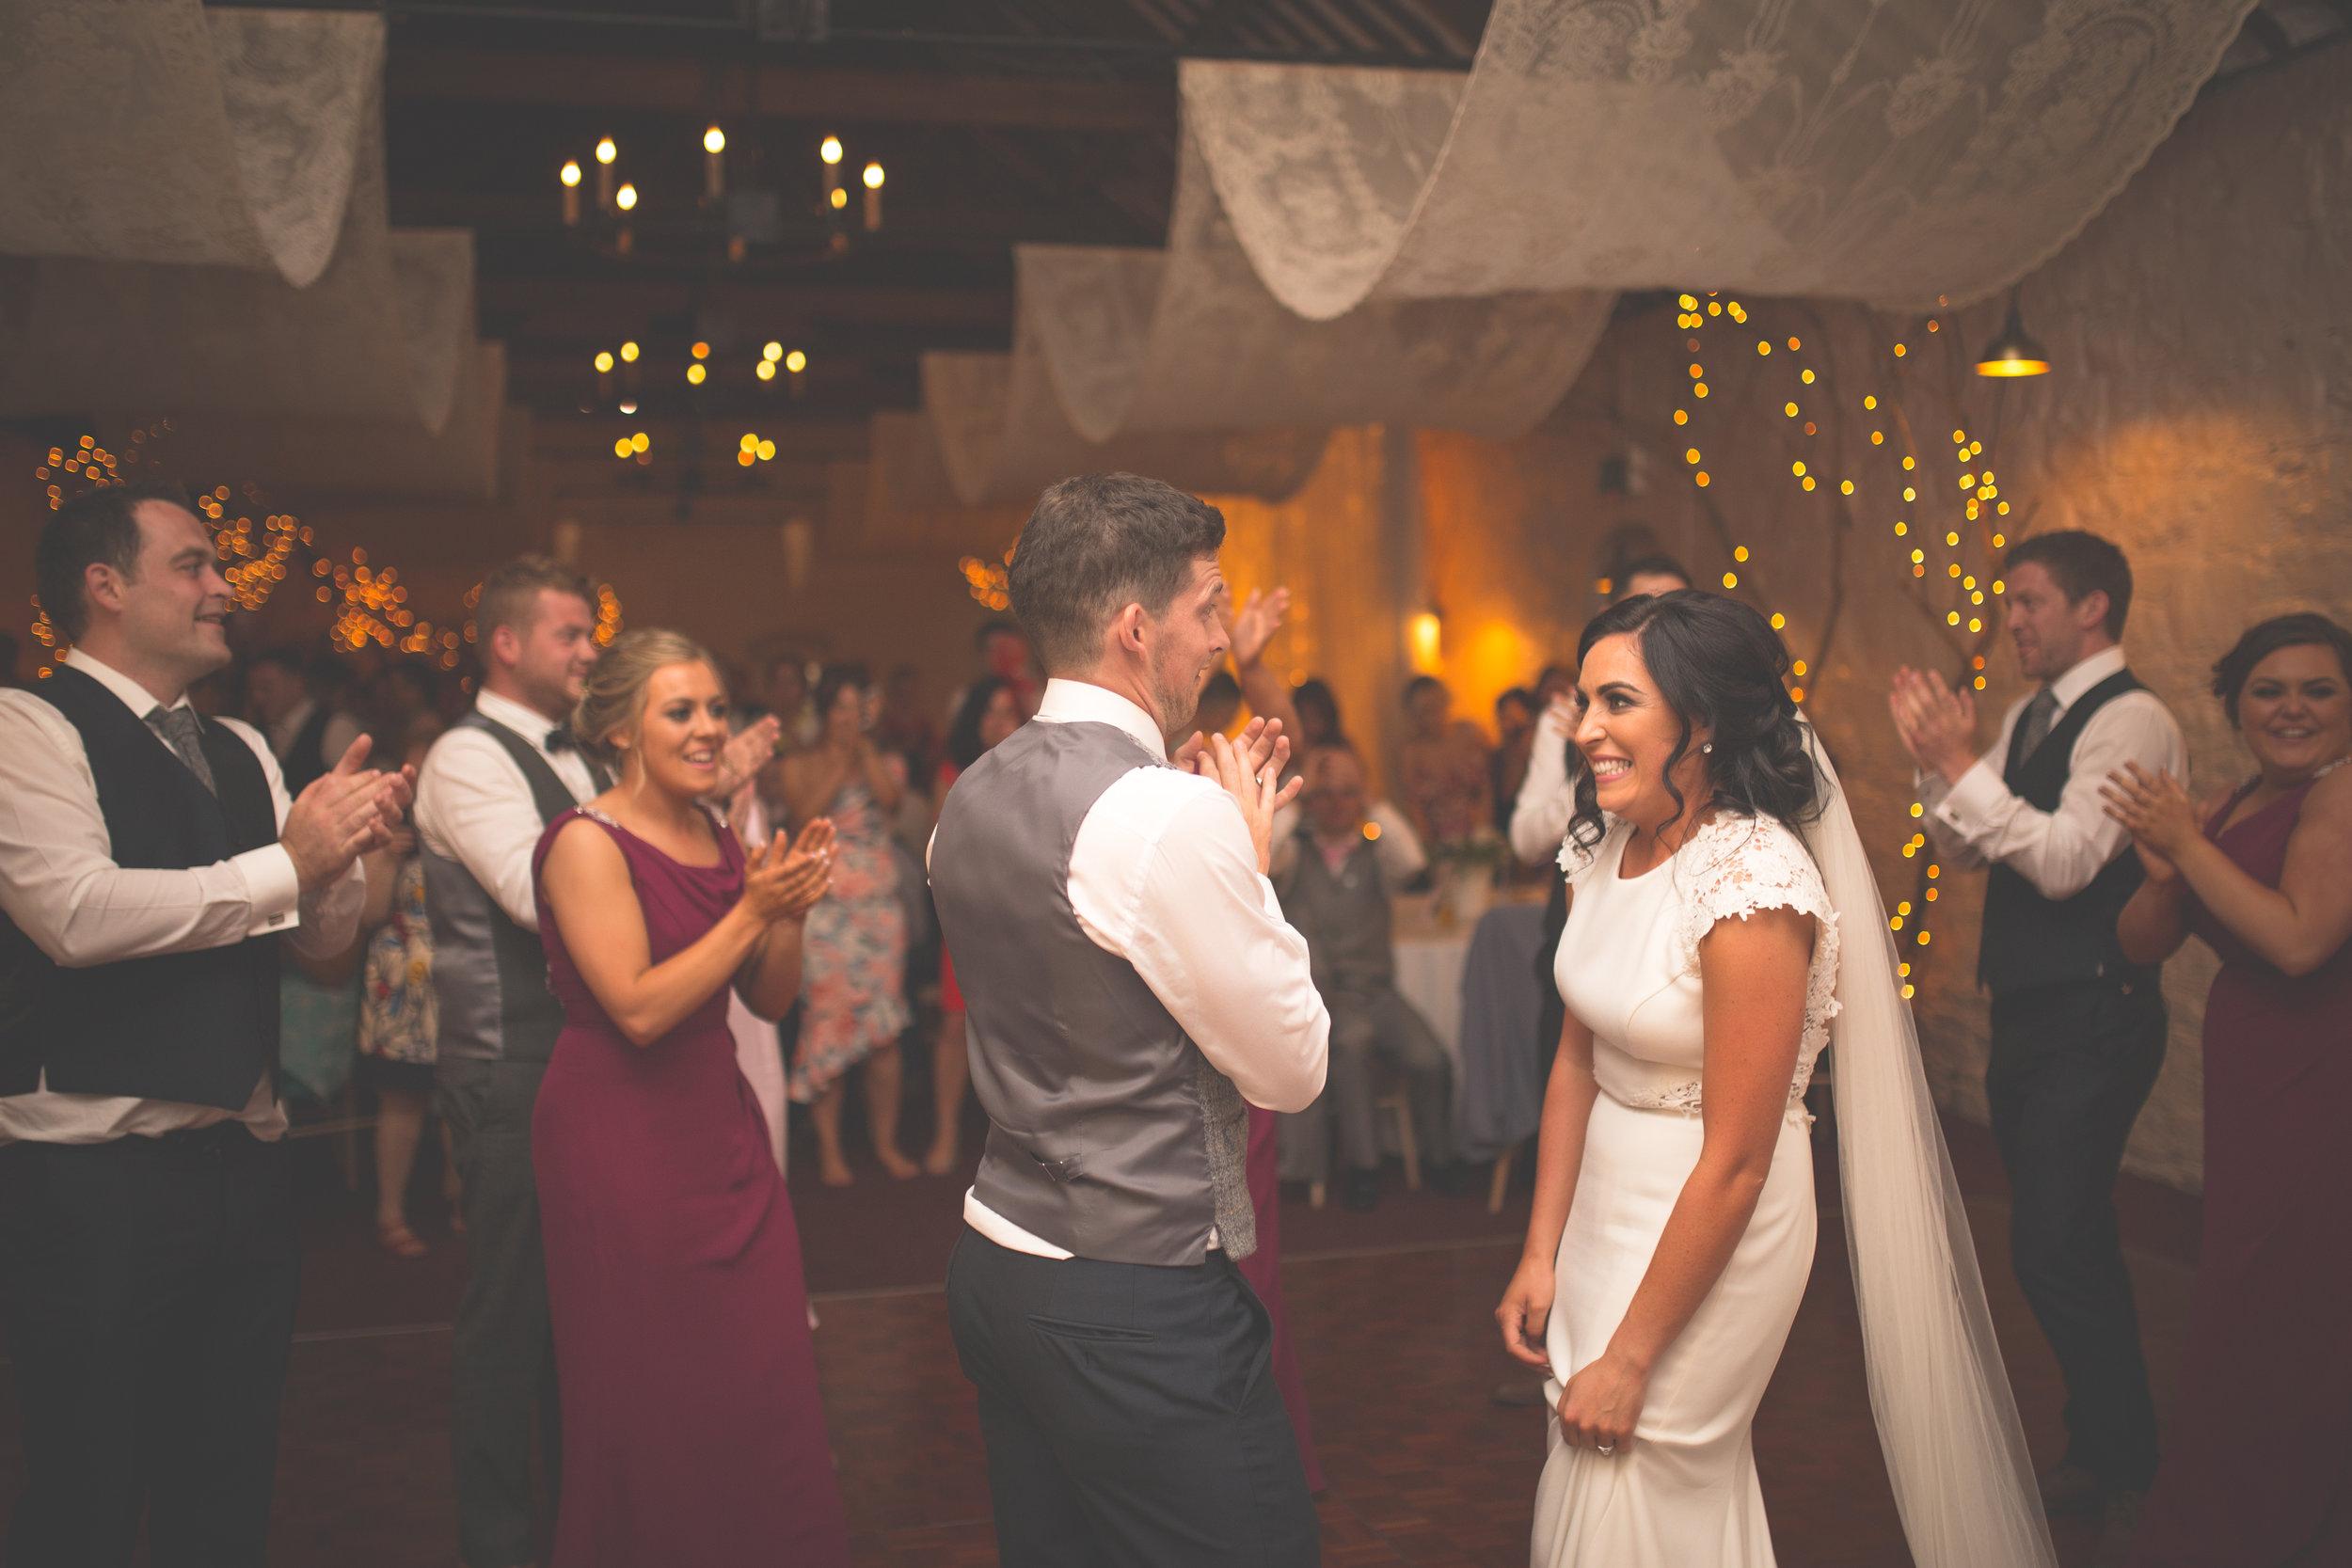 Brian McEwan Wedding Photography | Carol-Annee & Sean | The Dancing-52.jpg